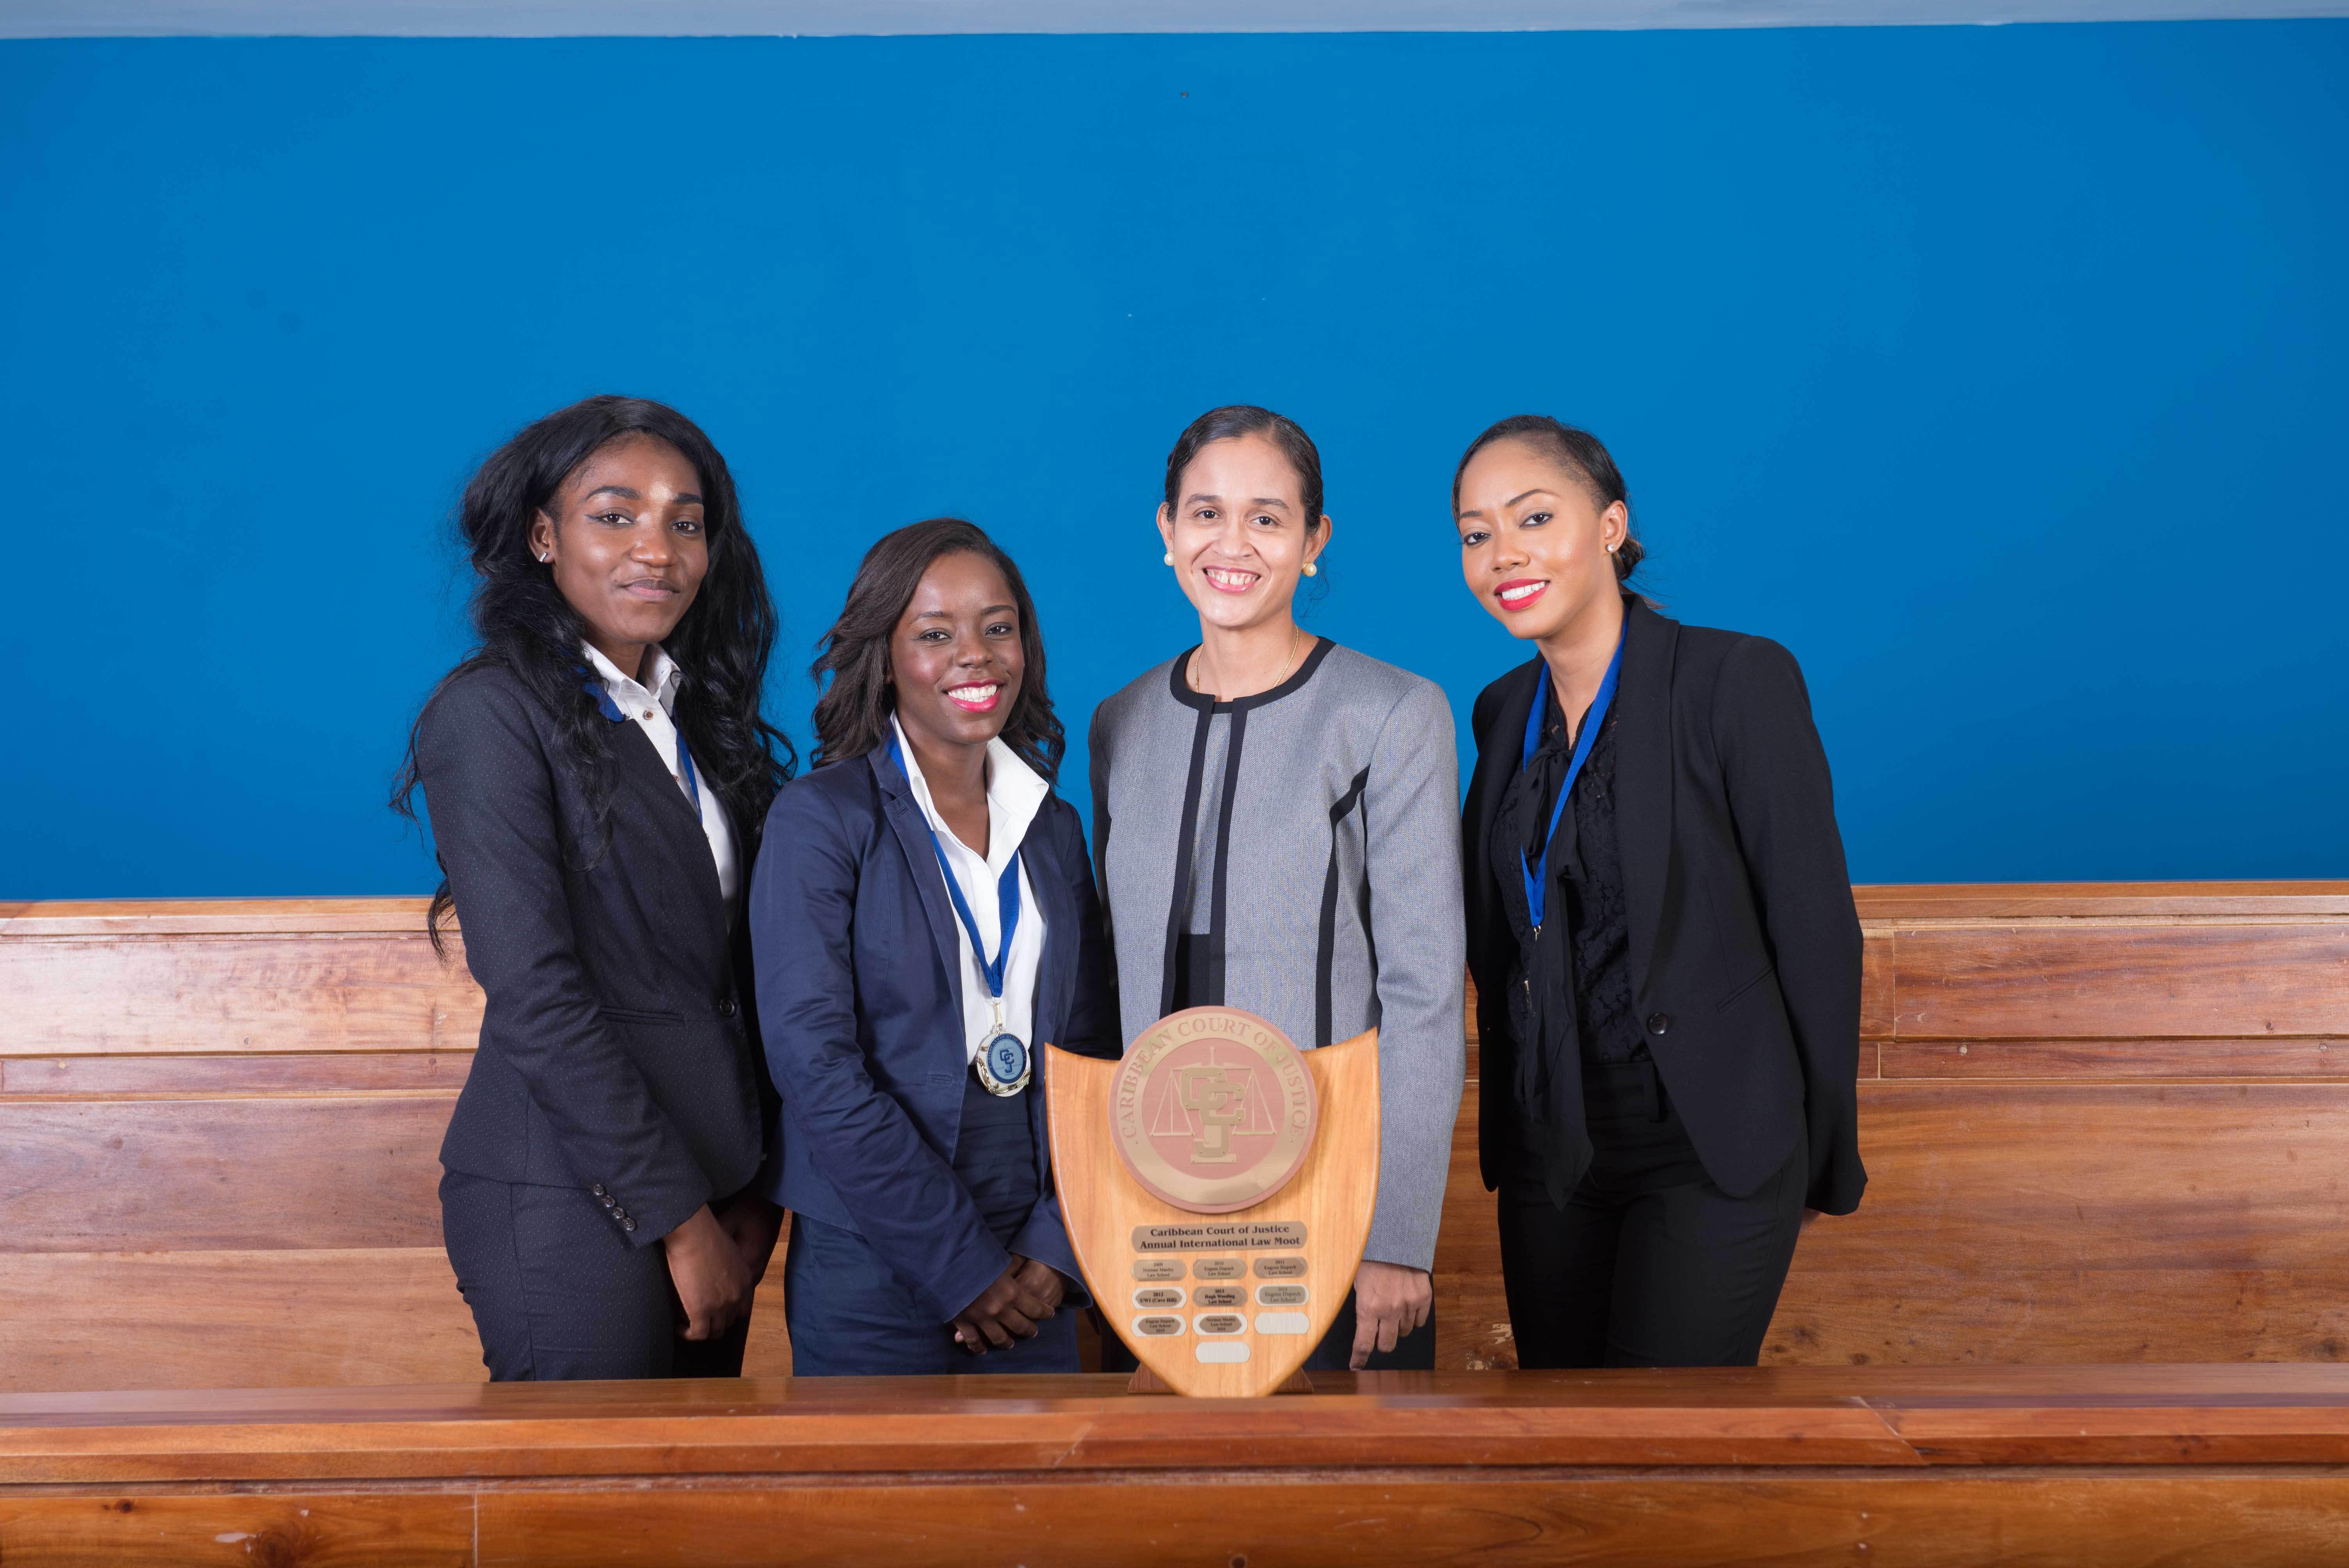 Mrs.JacquelineGraham, (left)presentstheawardfor'BestAcademicInstitution'toTeam UWI,CaveHillCampus(Photos via CCJ) AllfemalewinningteamfromtheEugeneDupuchLawSchool